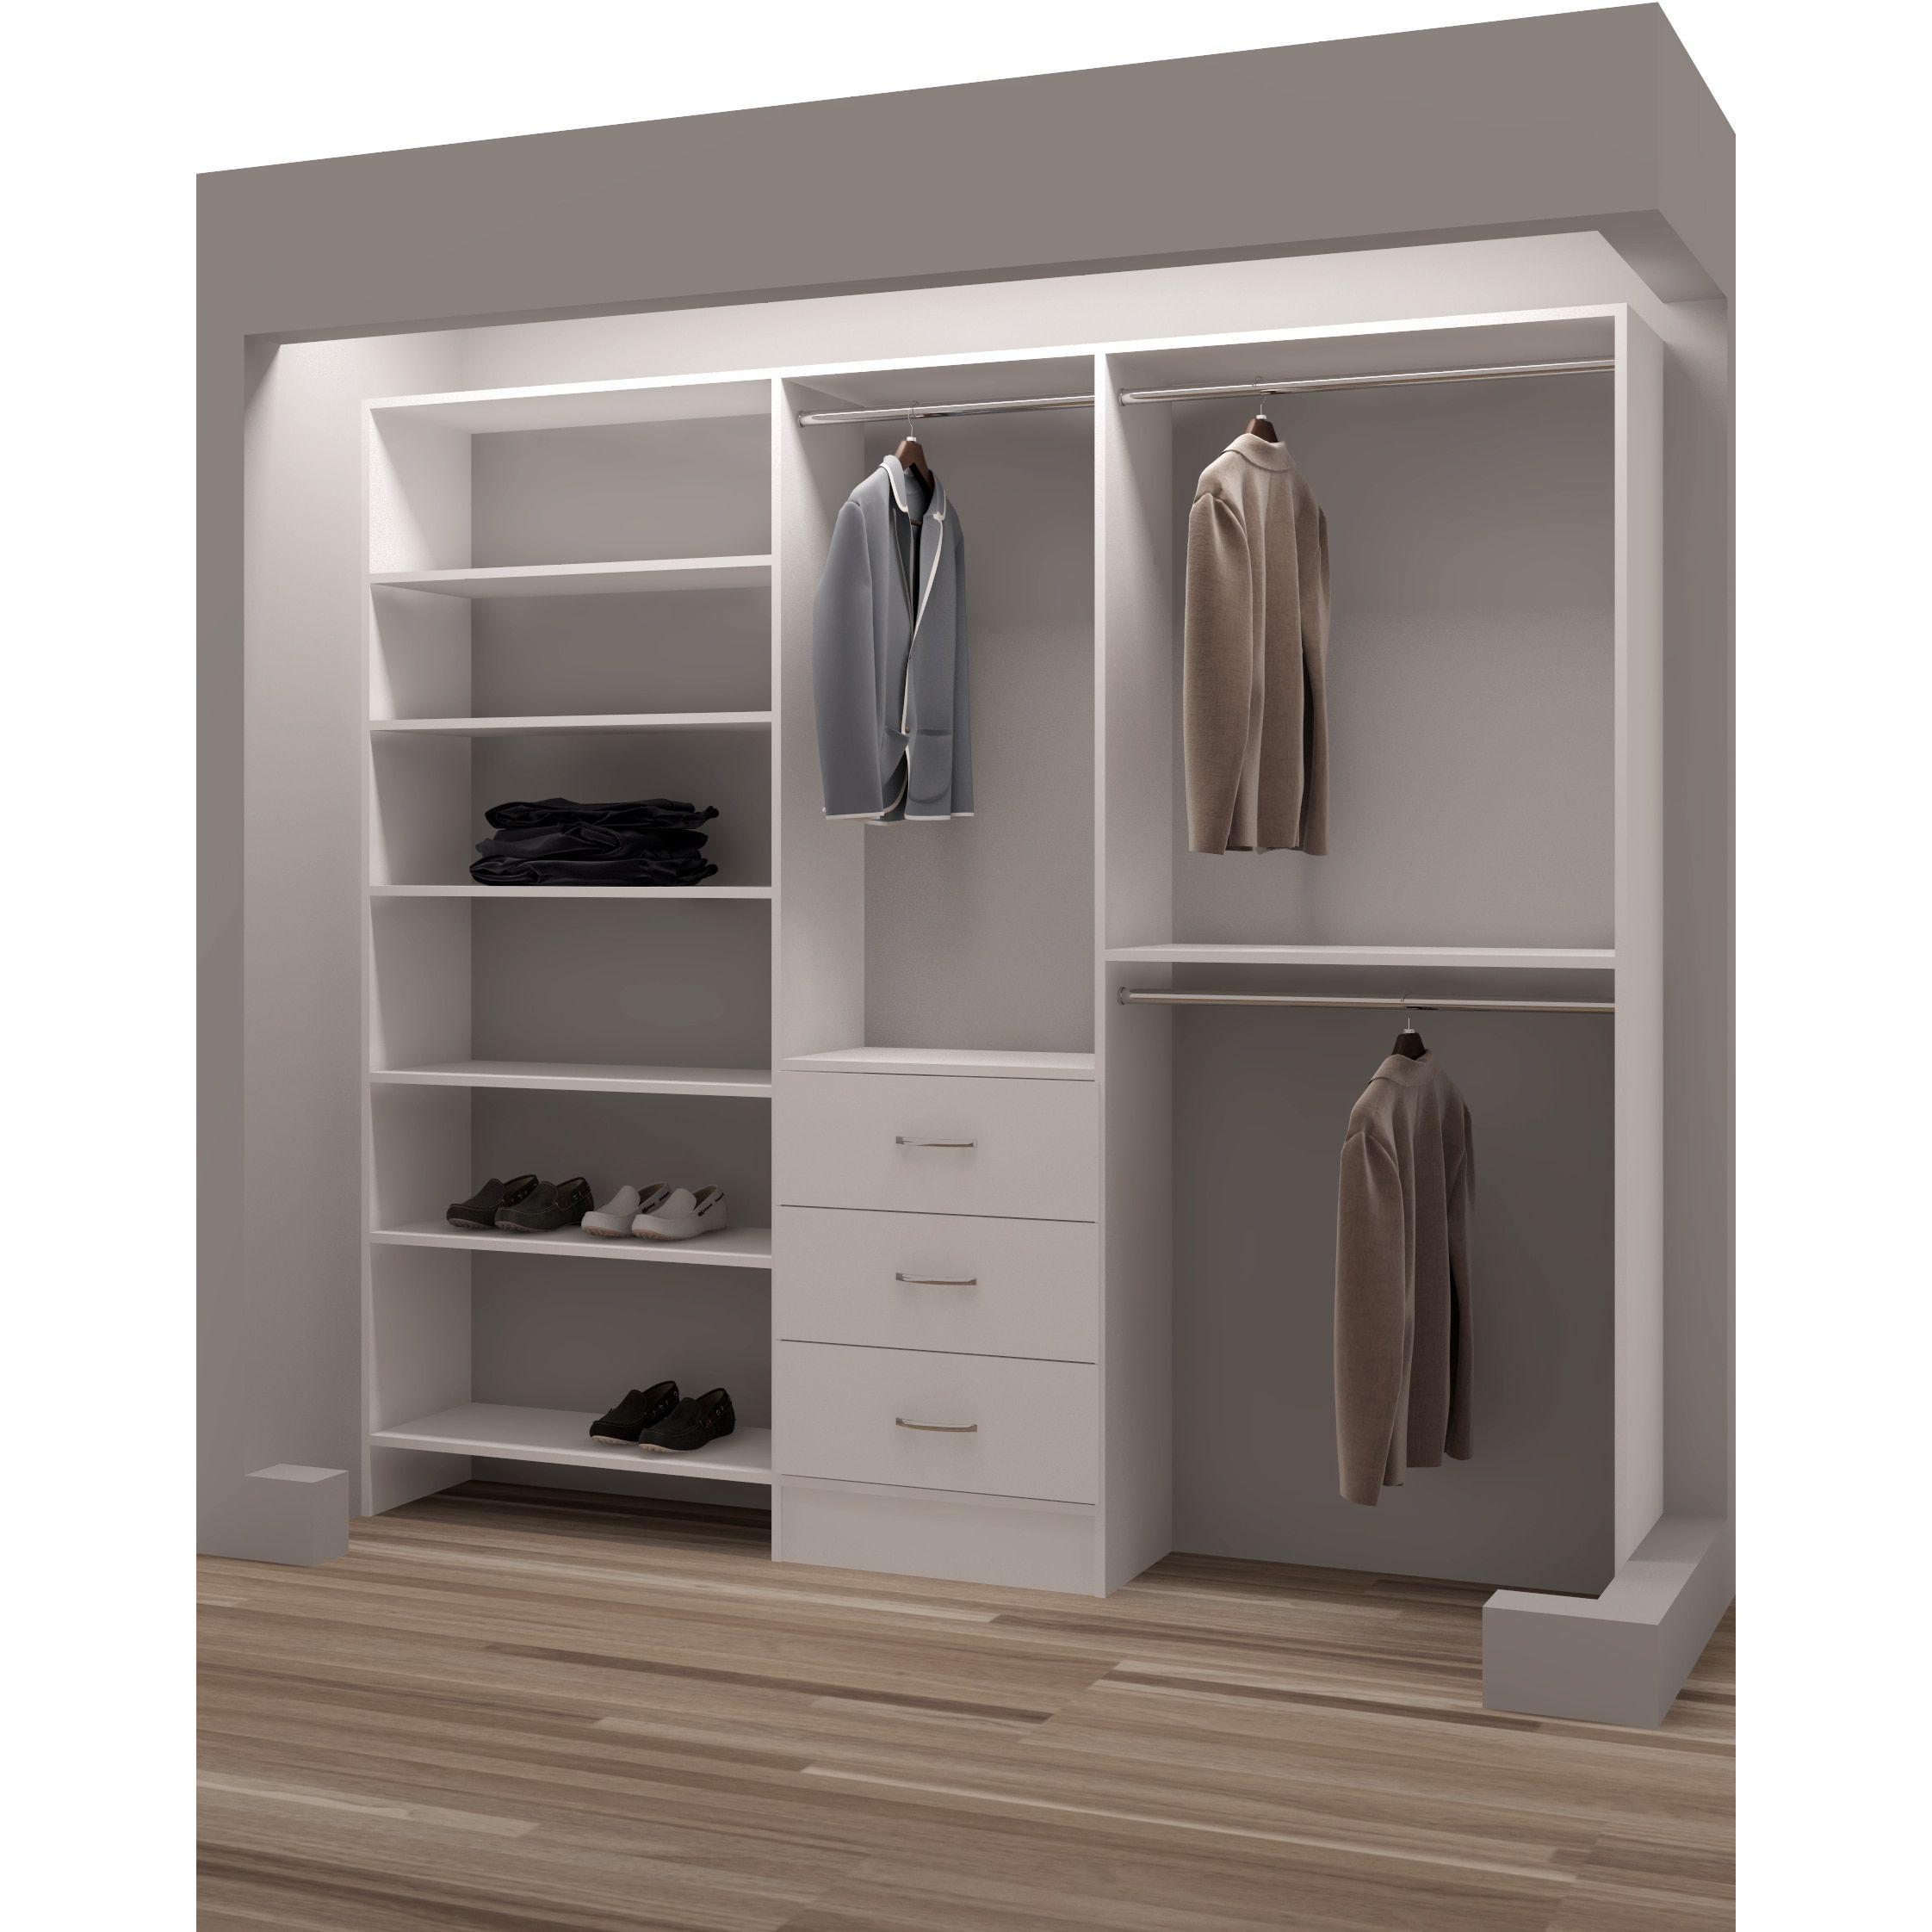 Closet door ideas organizer systems